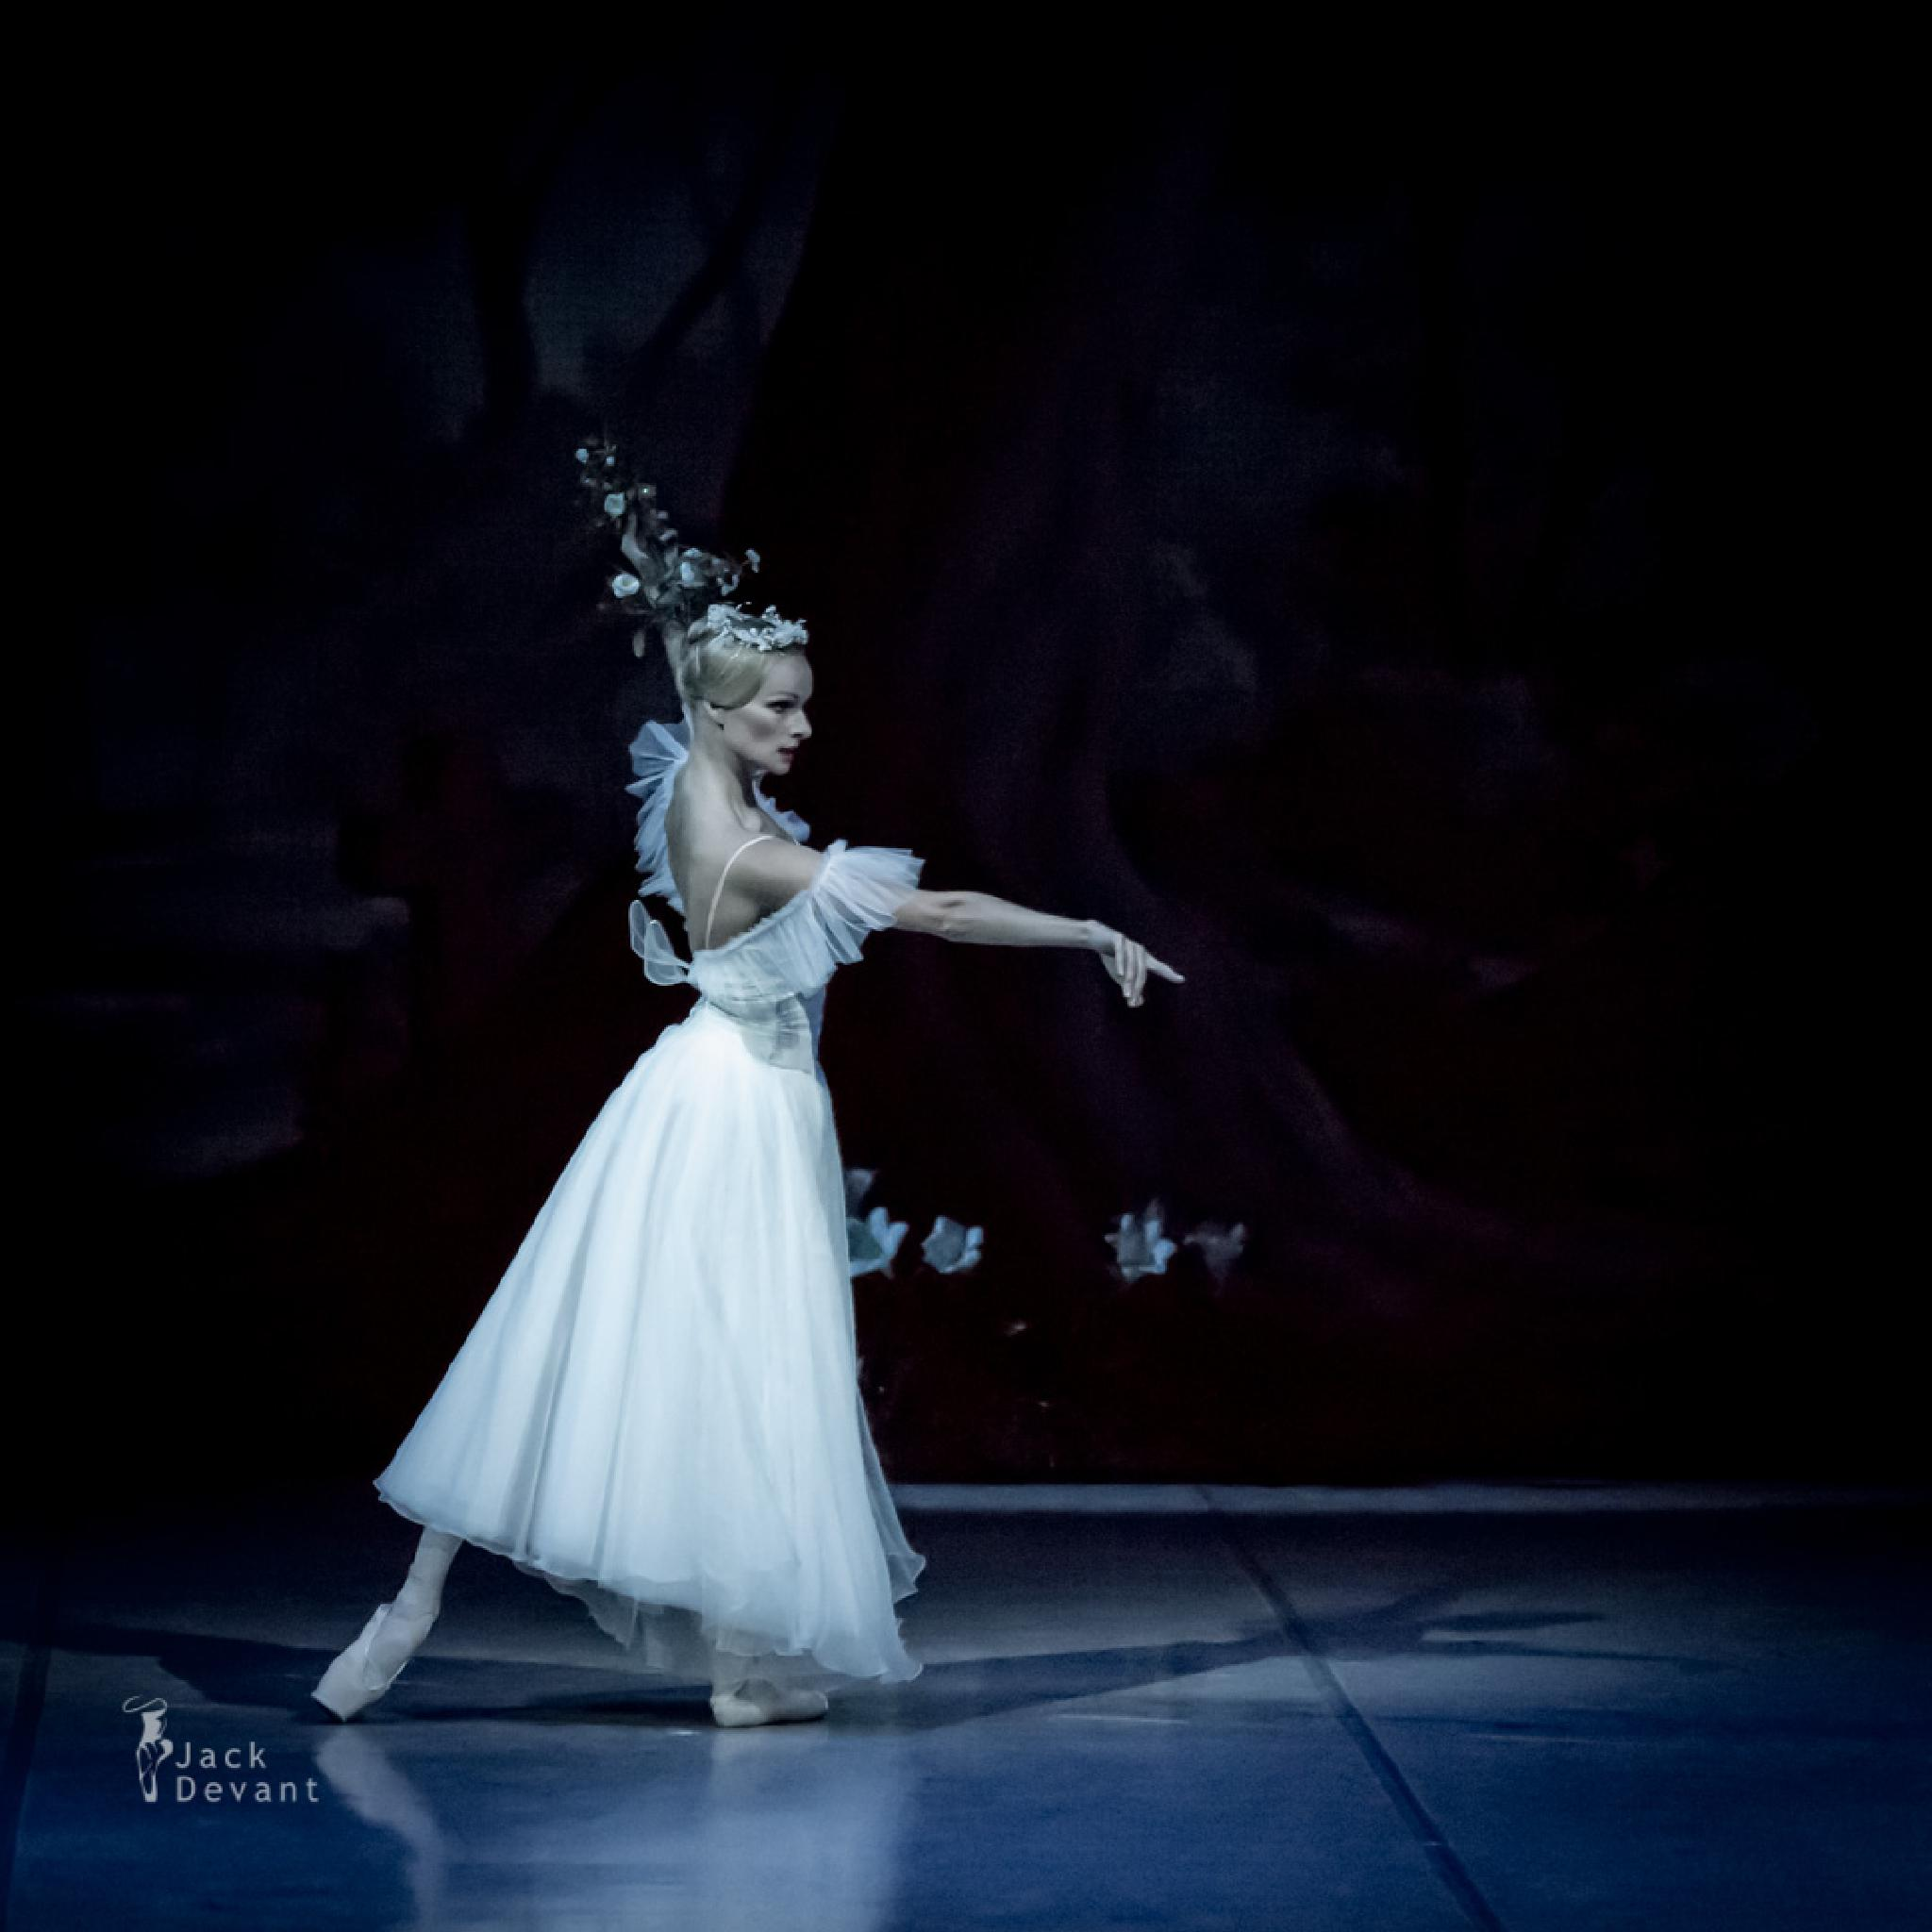 Ekaterina Borchenko as Myrtha in Giselle by Jack Devant